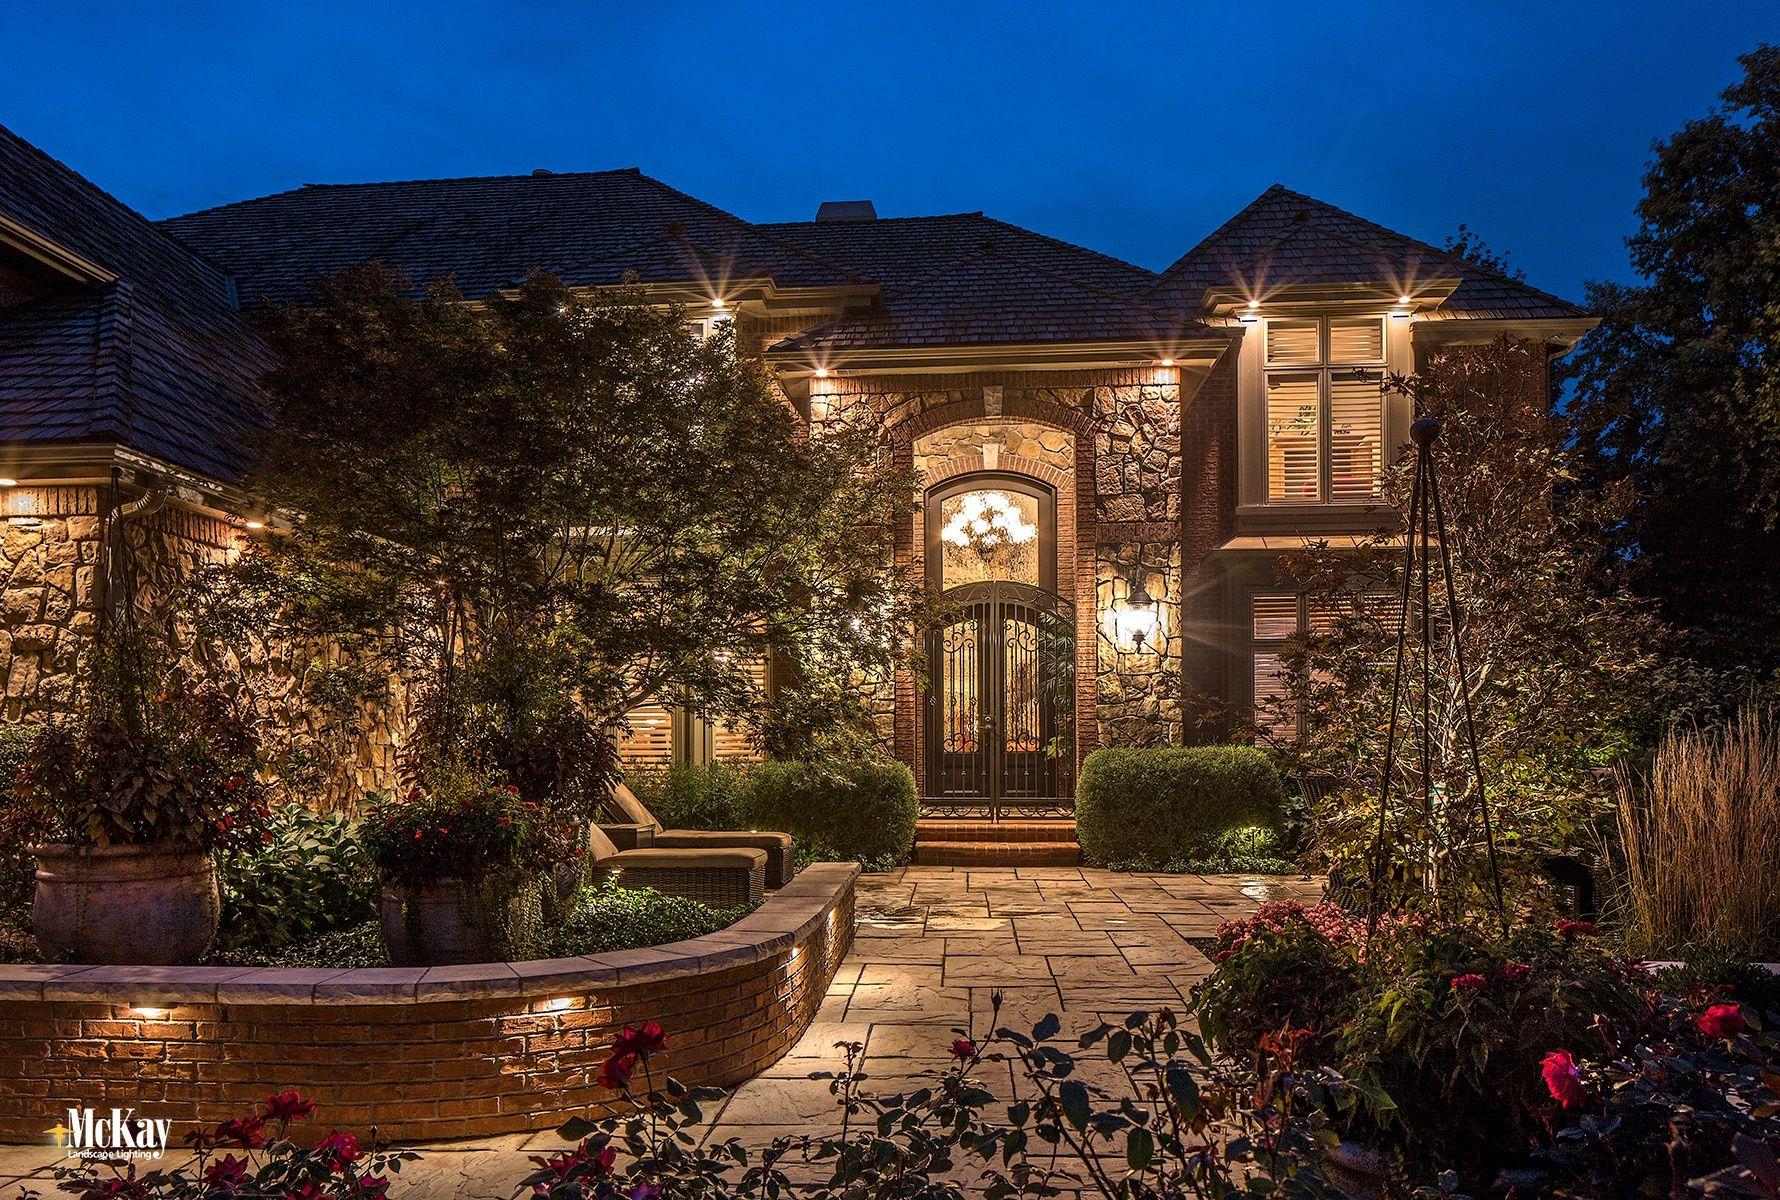 An Omaha Deck Patio Gets A Landscape Lighting Refresh Garden Path Lighting Landscape Lighting Outdoor Lighting